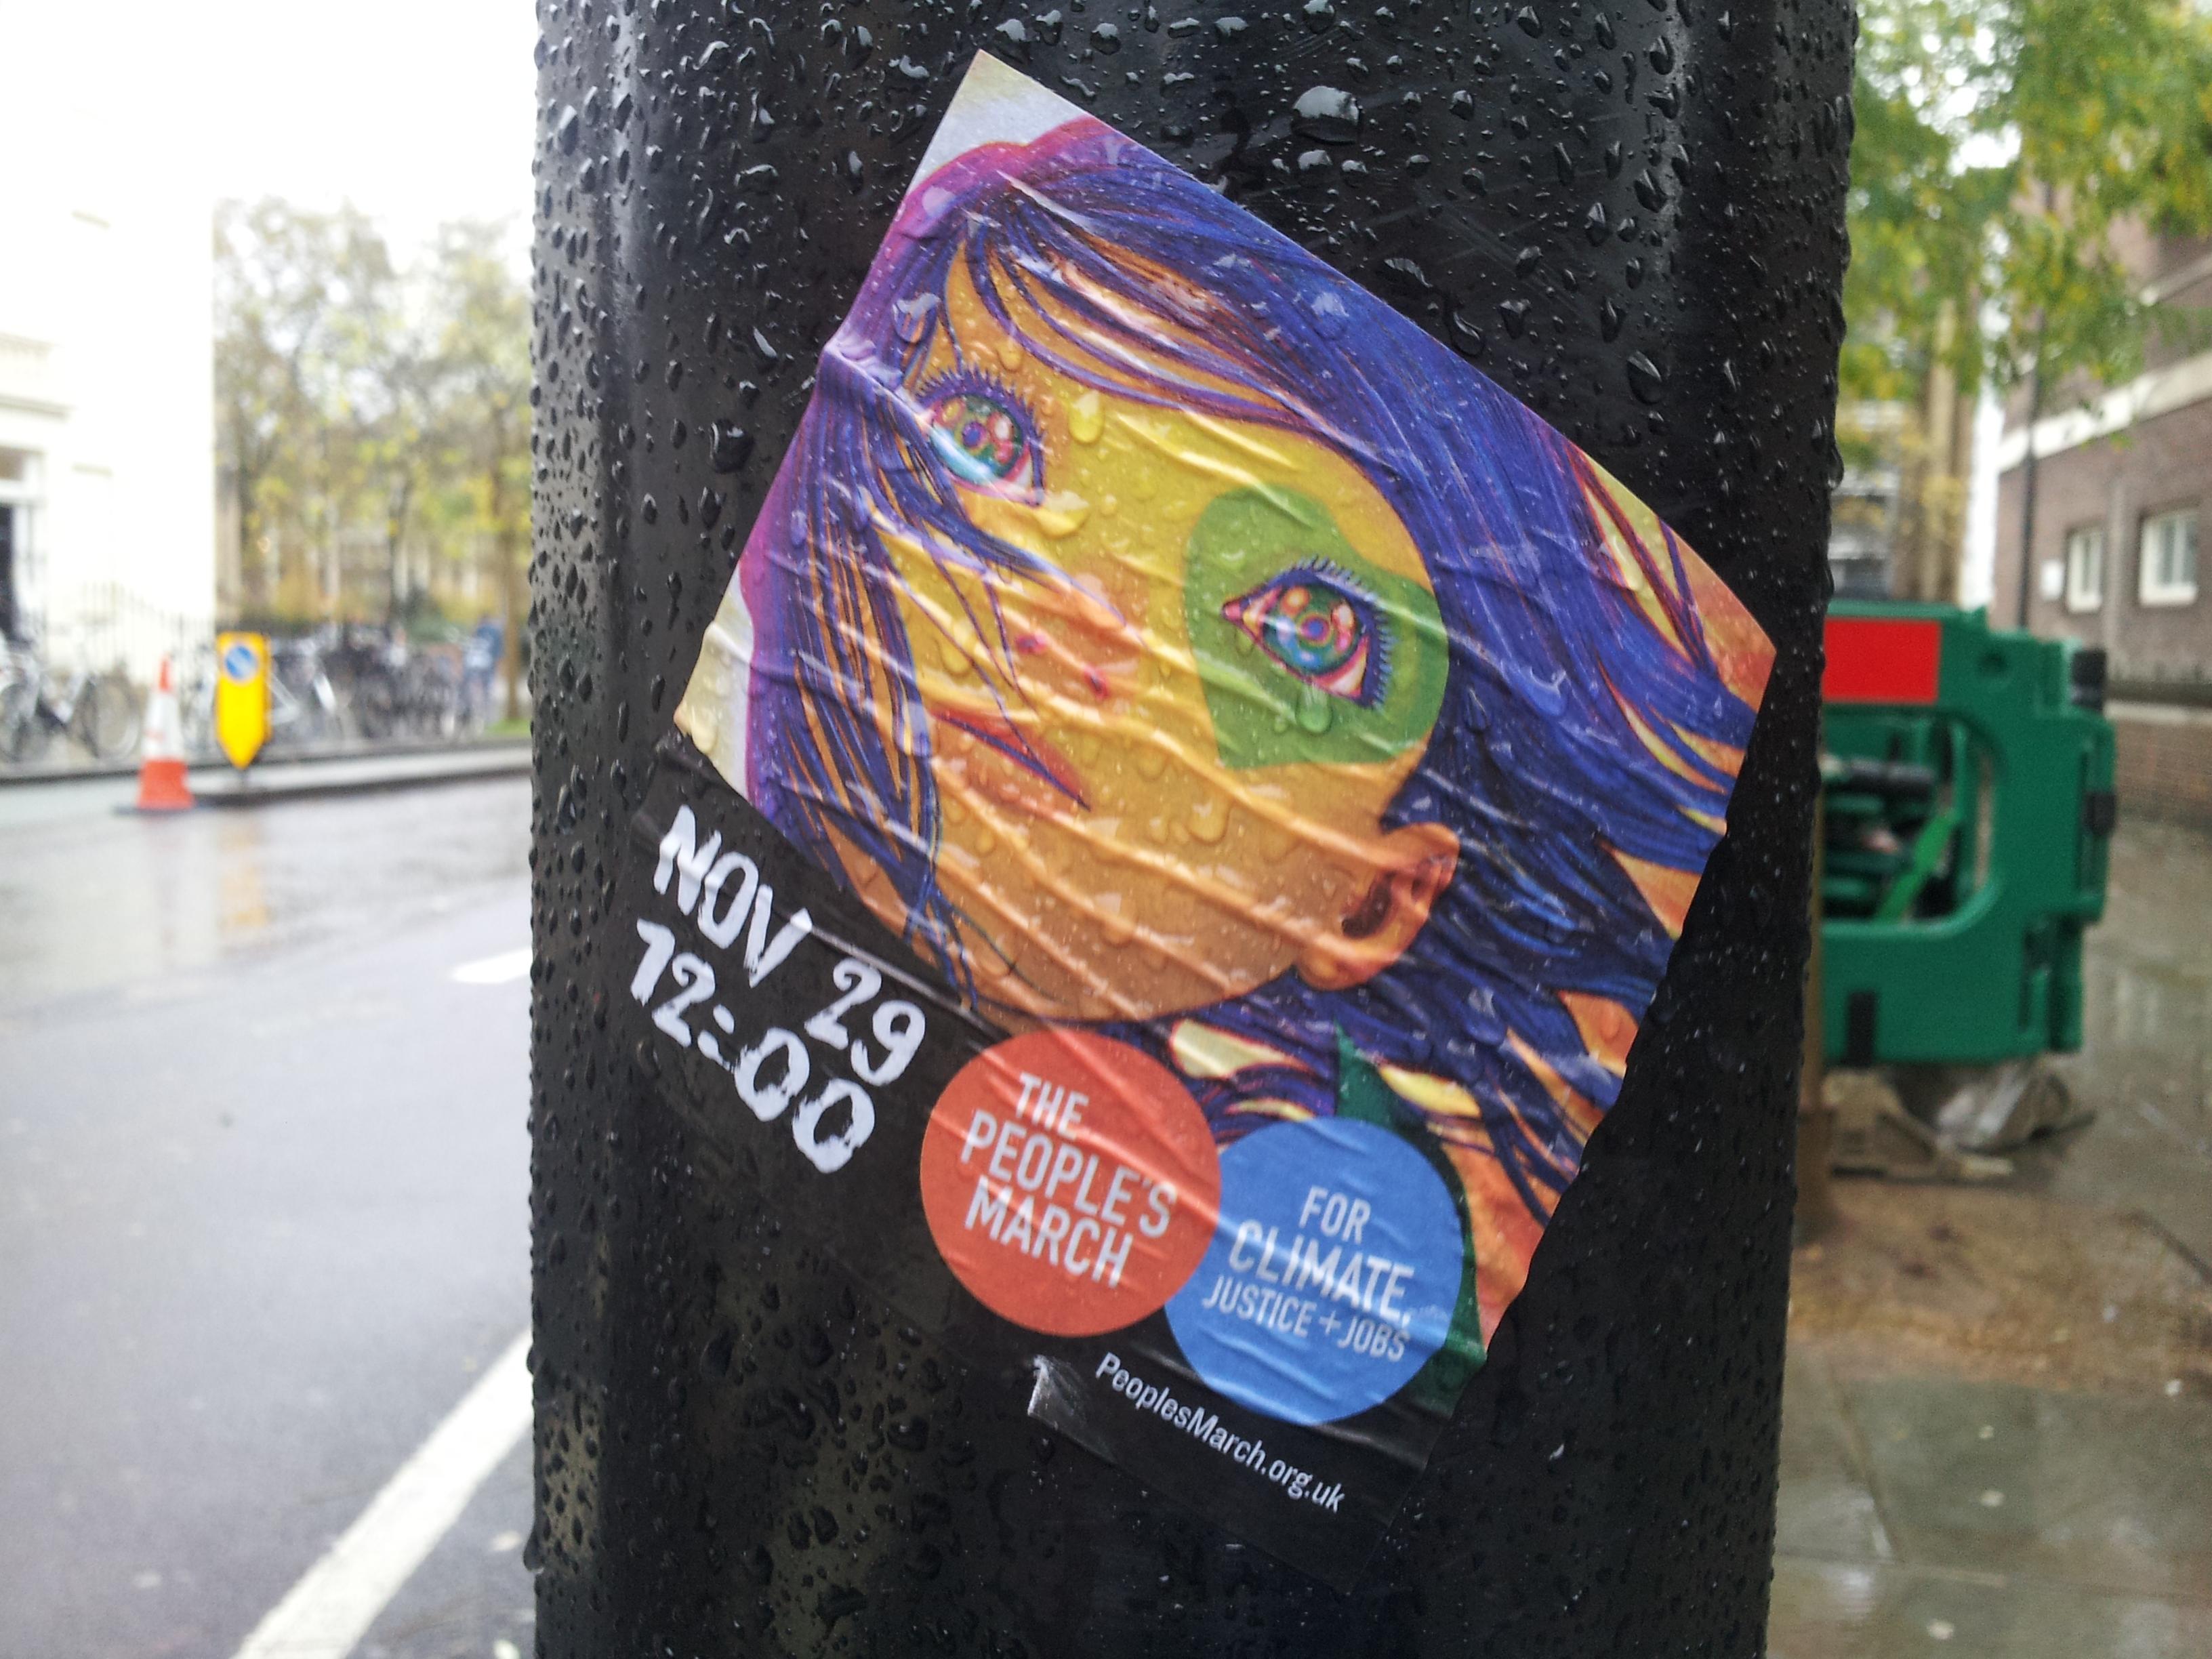 17-11-15 Malet Street (2)